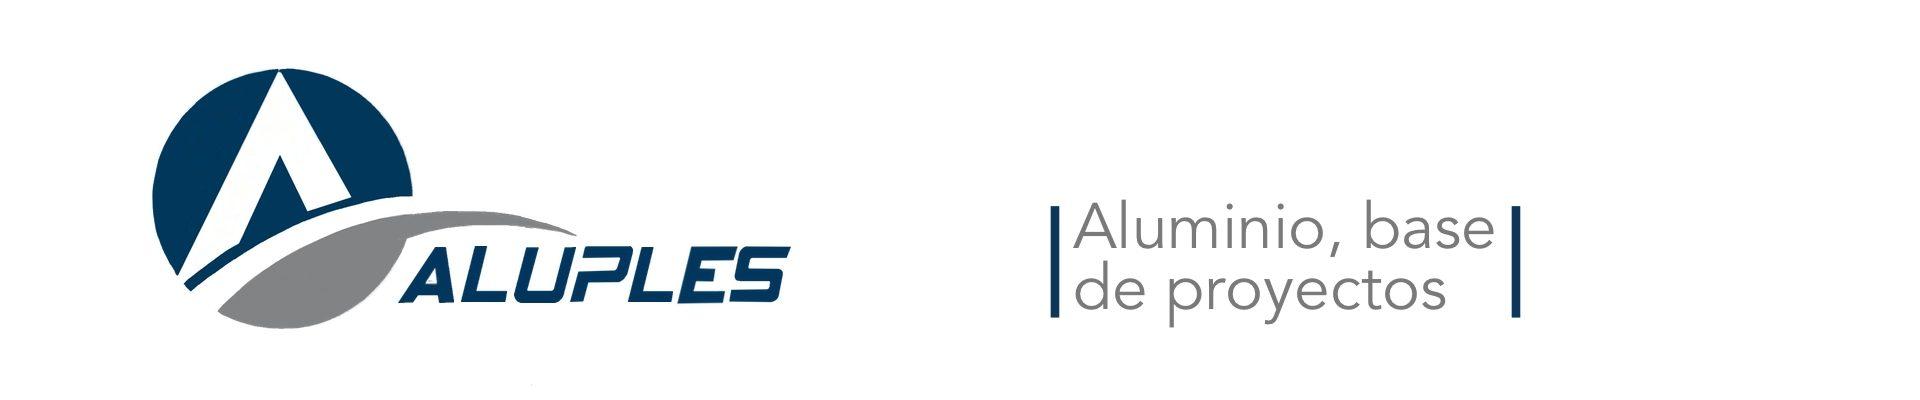 CHAPA DE ALUMINIO|ALUPLES